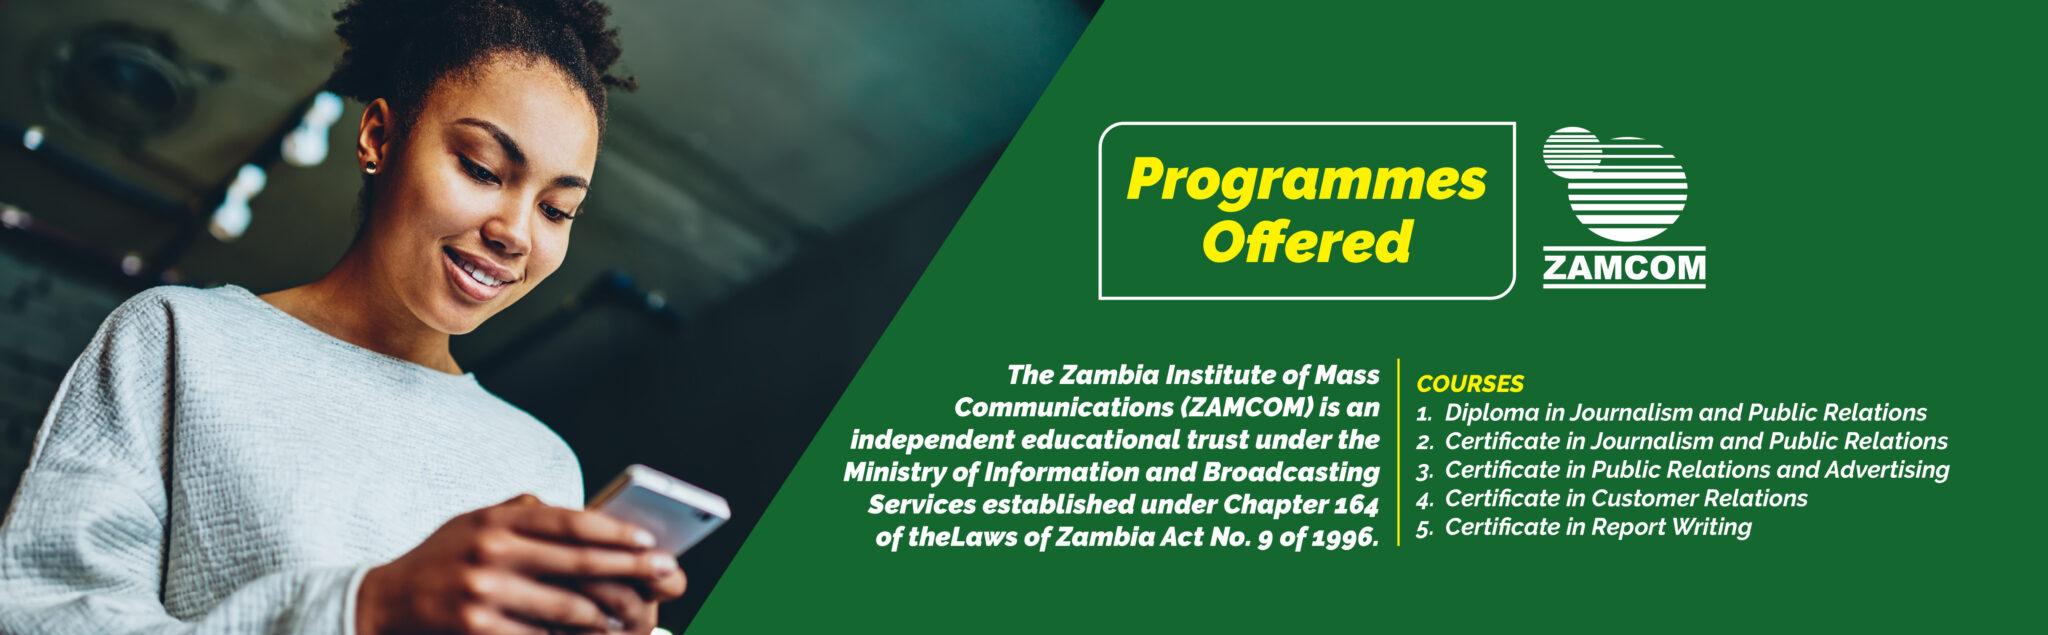 ZAMCOM WEBSITE IMAGES - 1290px x 400px4-2